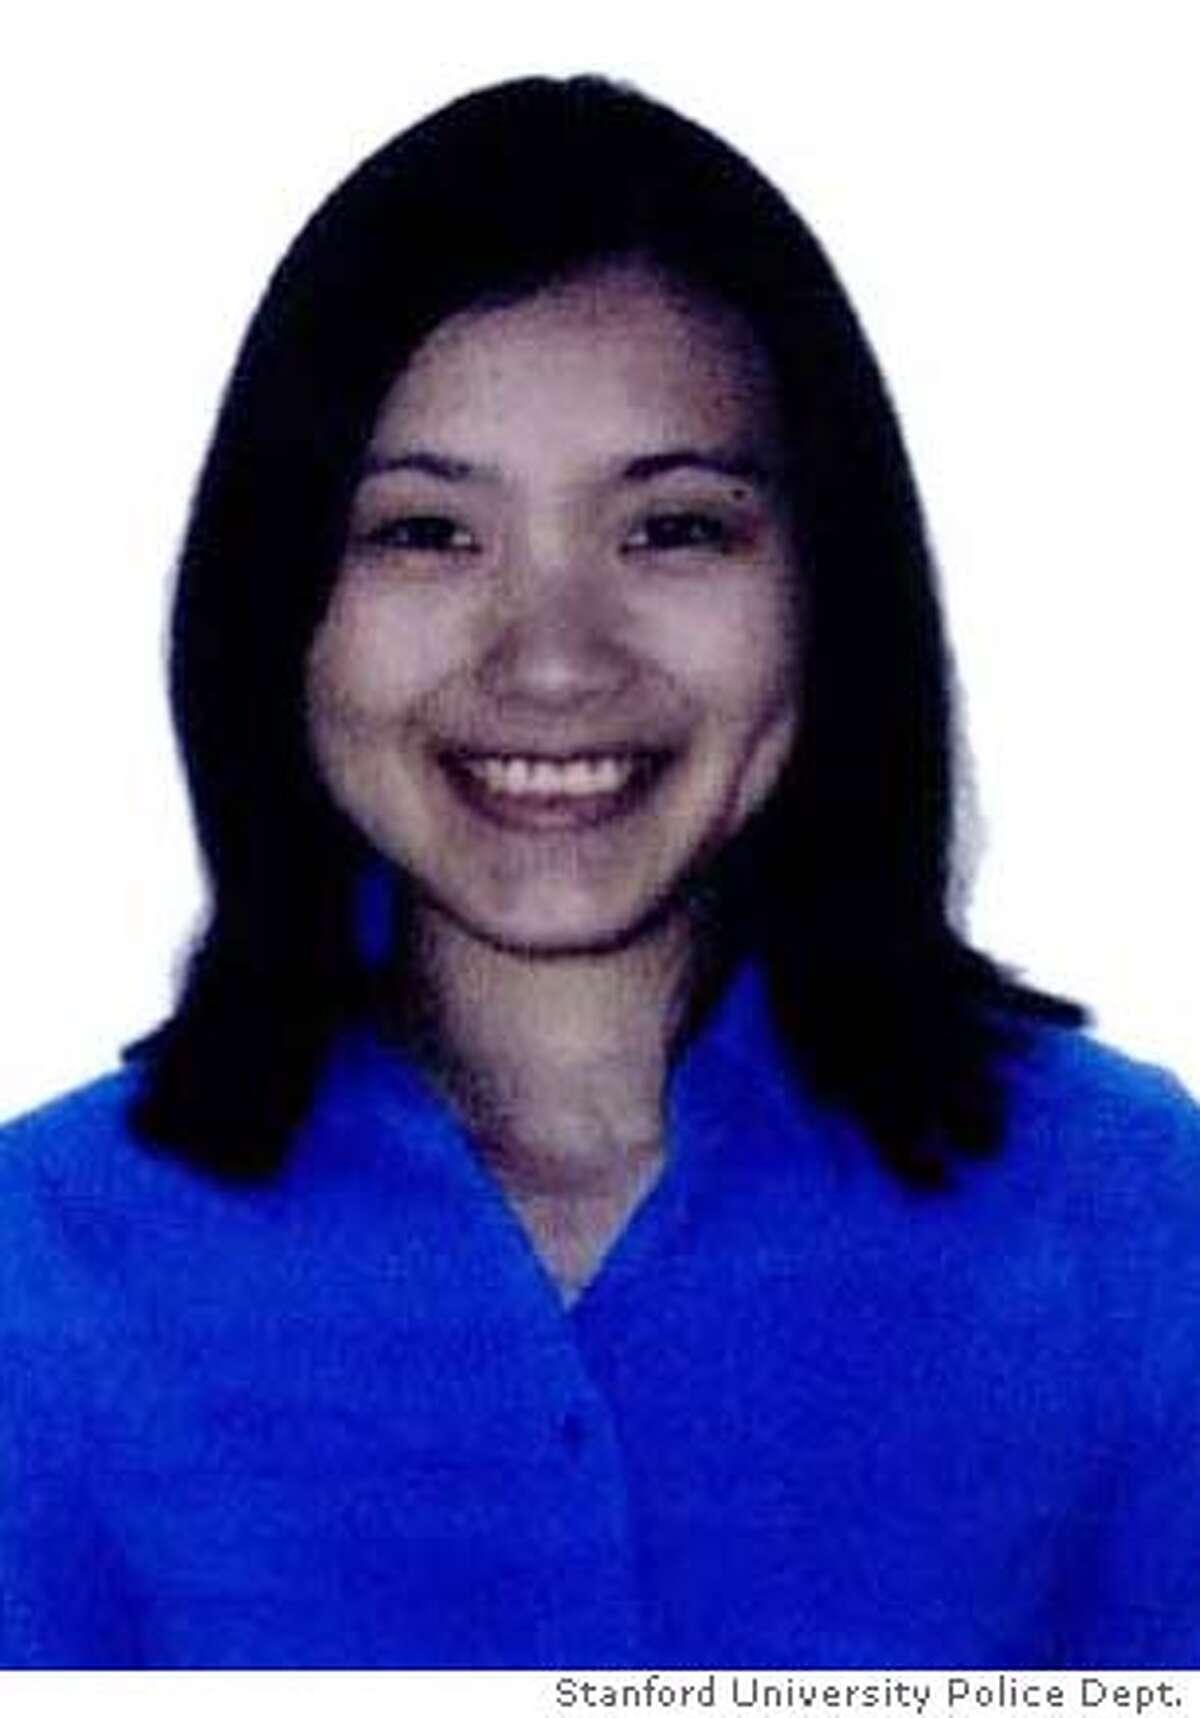 Missing Stanford grad student Mengyeo Zhou. CR: Stanford University Police Dept.